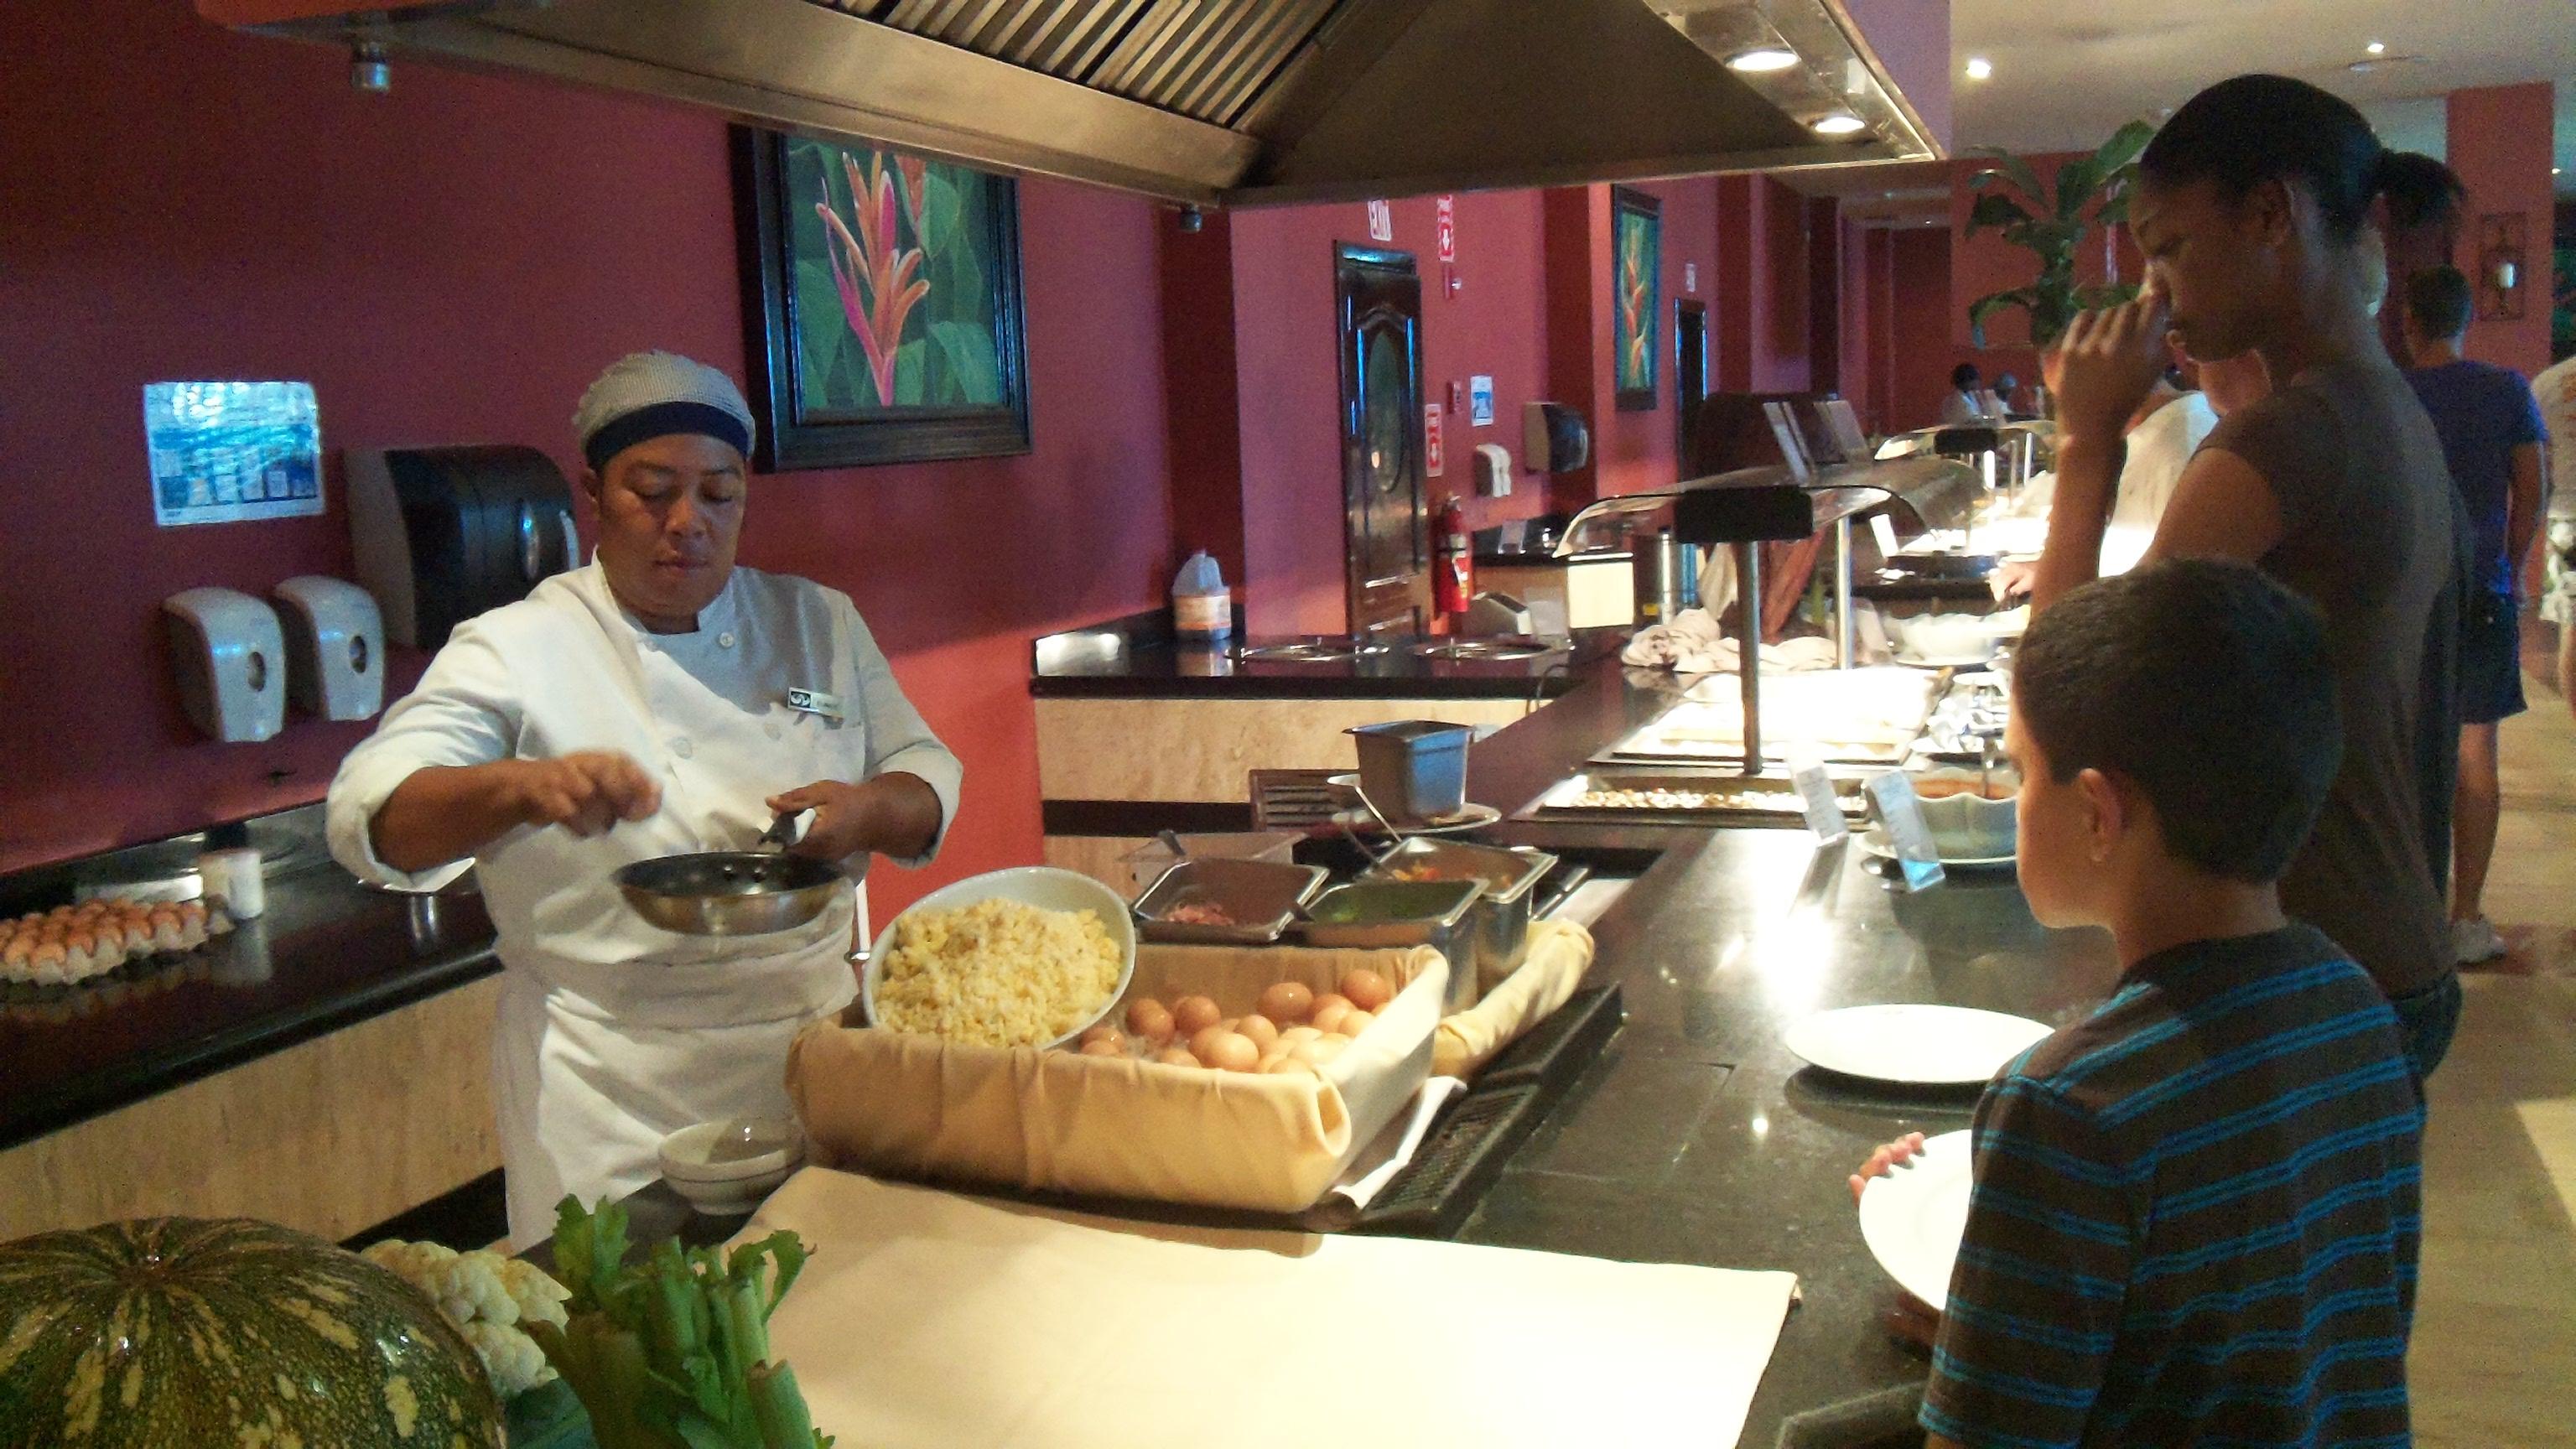 Family Friendly Resort In Jamaica The Grand Palladium Hotels